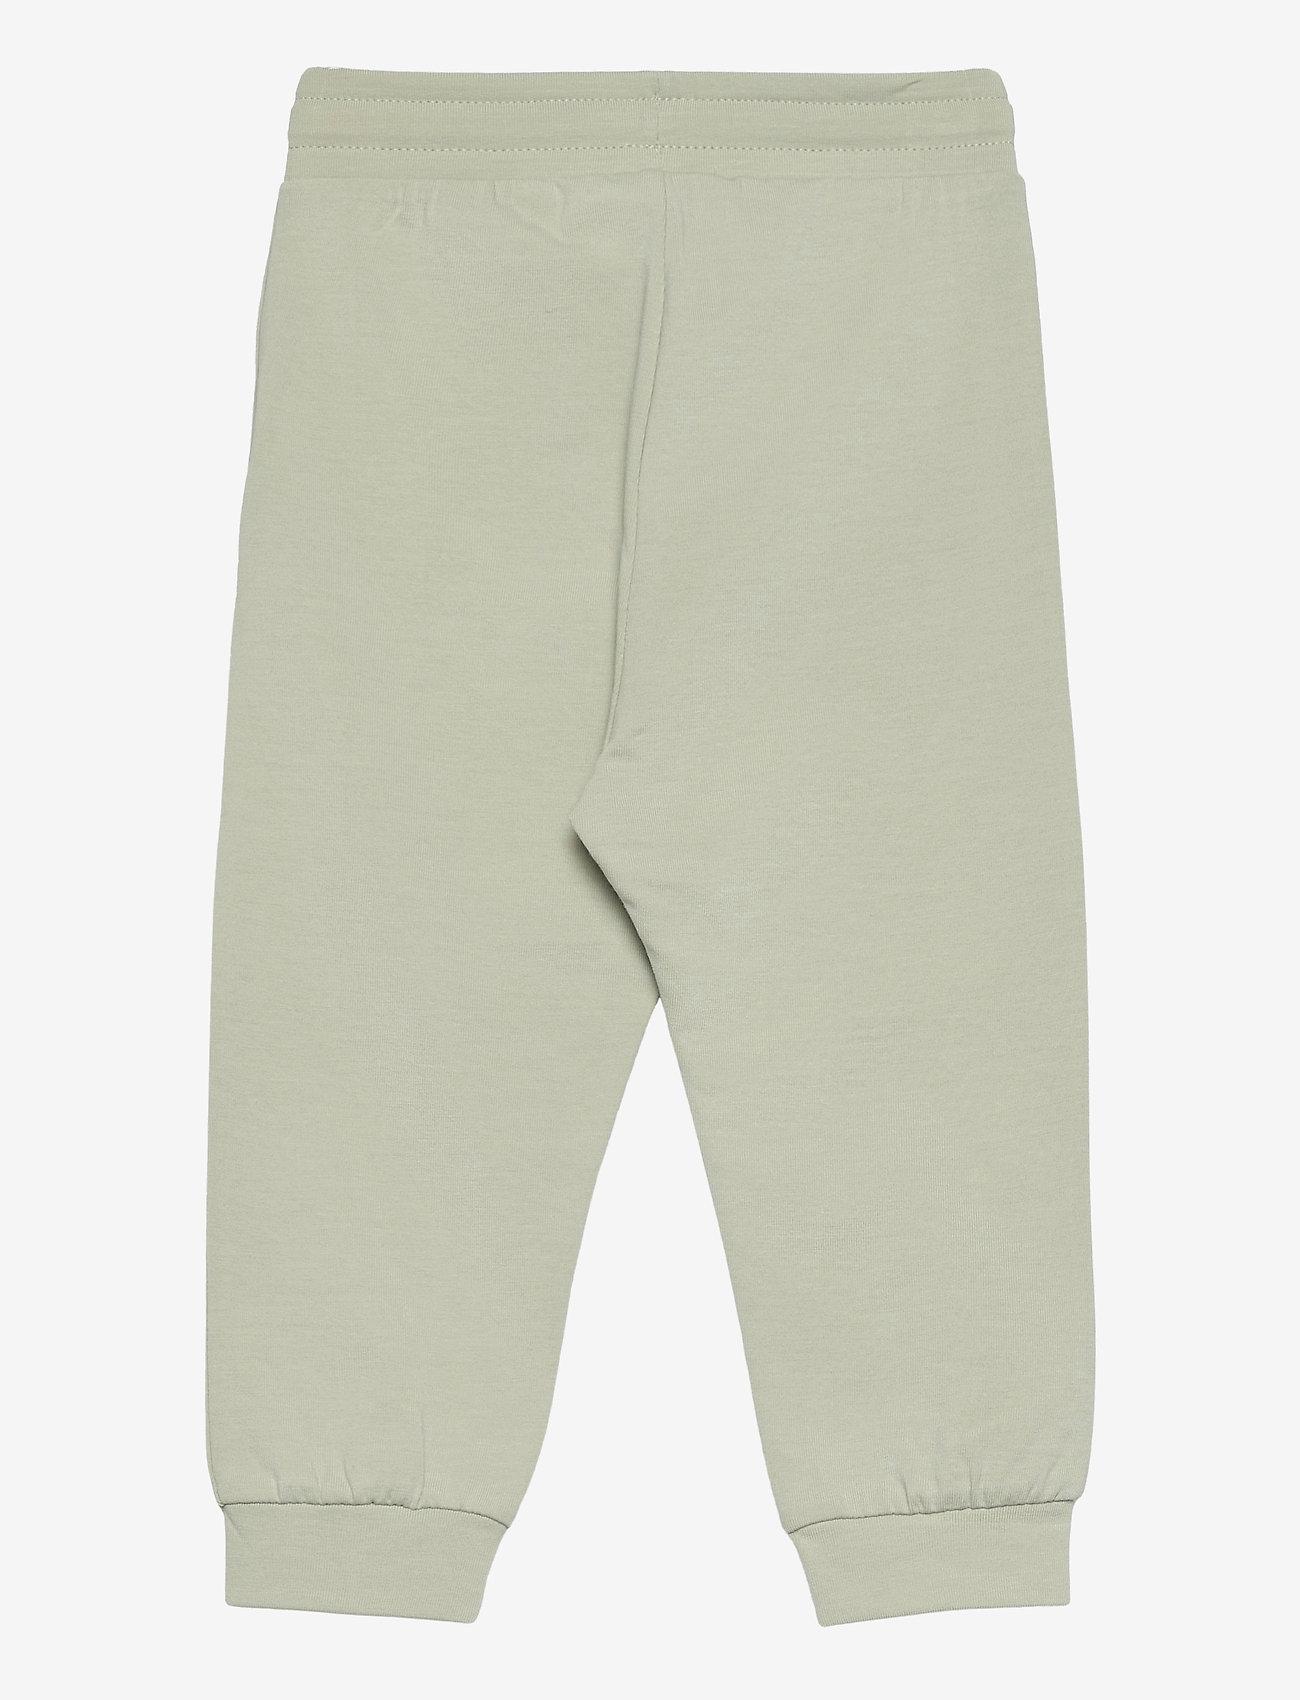 Hummel - hmlFUTTE PANTS - sweatpants - desert sage - 1